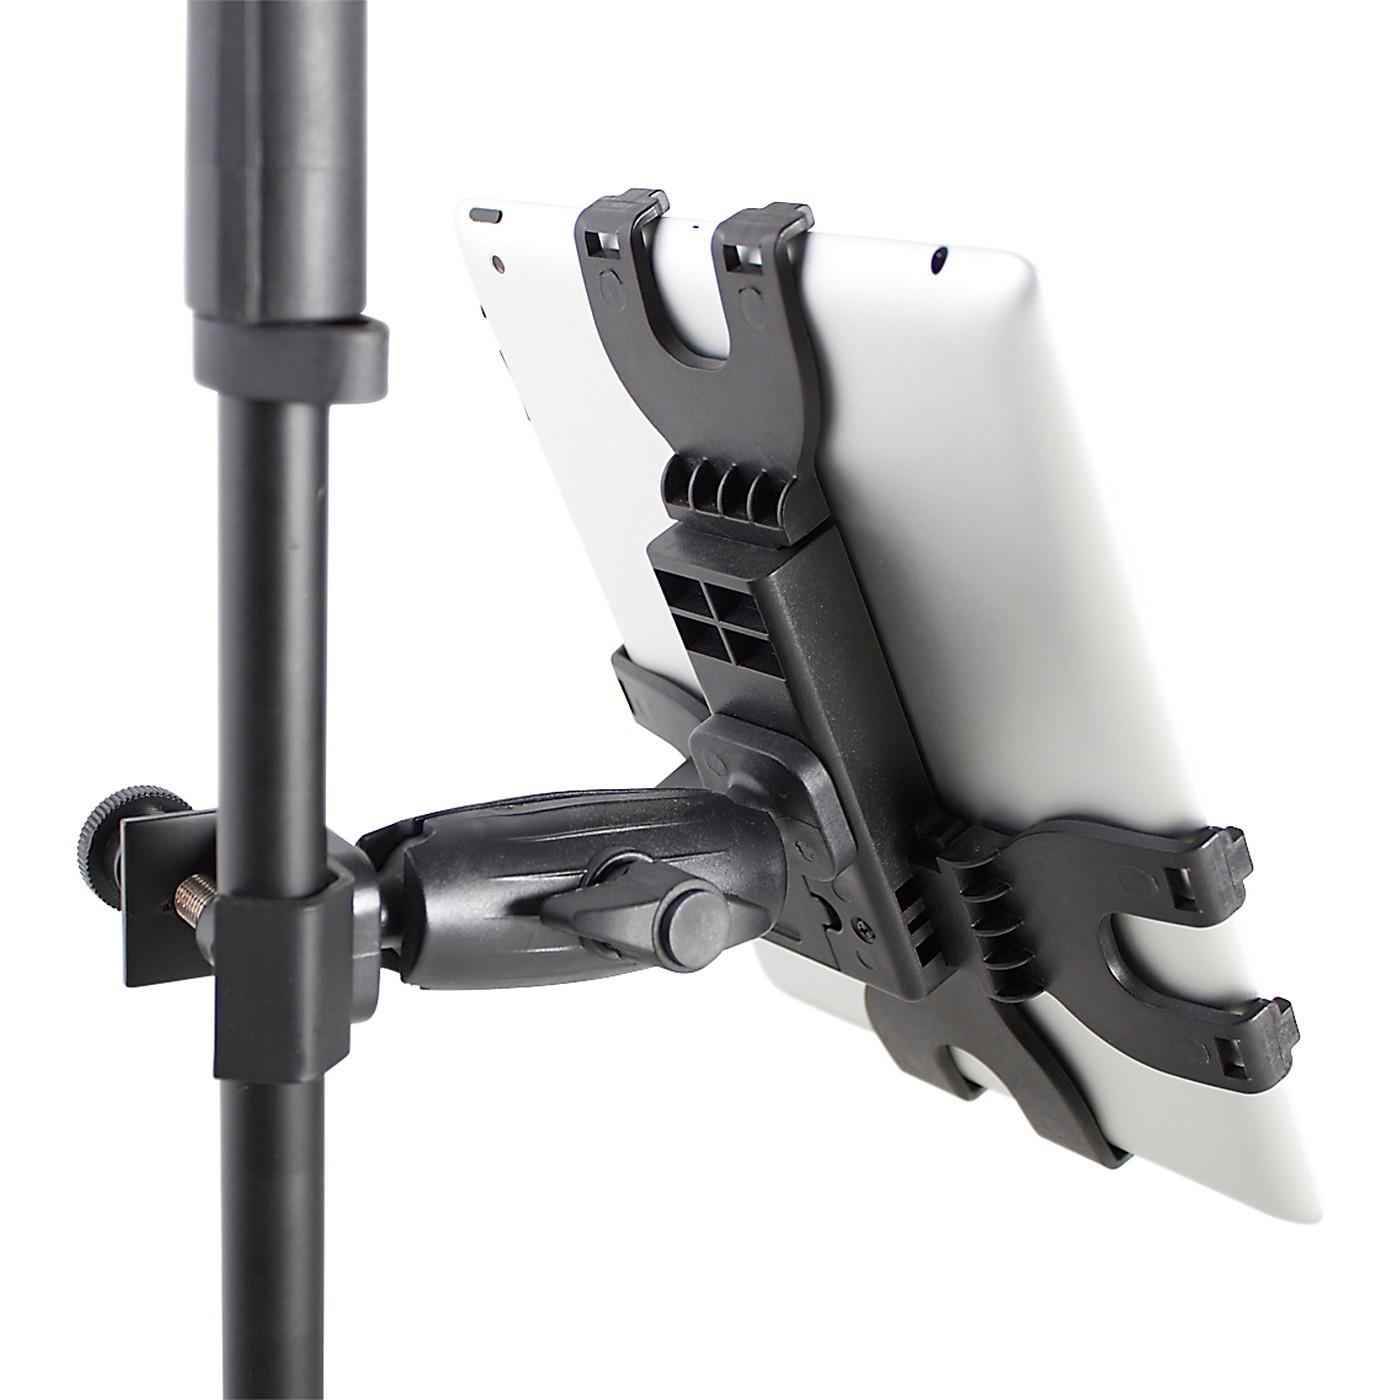 Gator GFW-UTL-TBLTCLMP iPad Tablet Tray with Adjustable Clamp Mount thumbnail